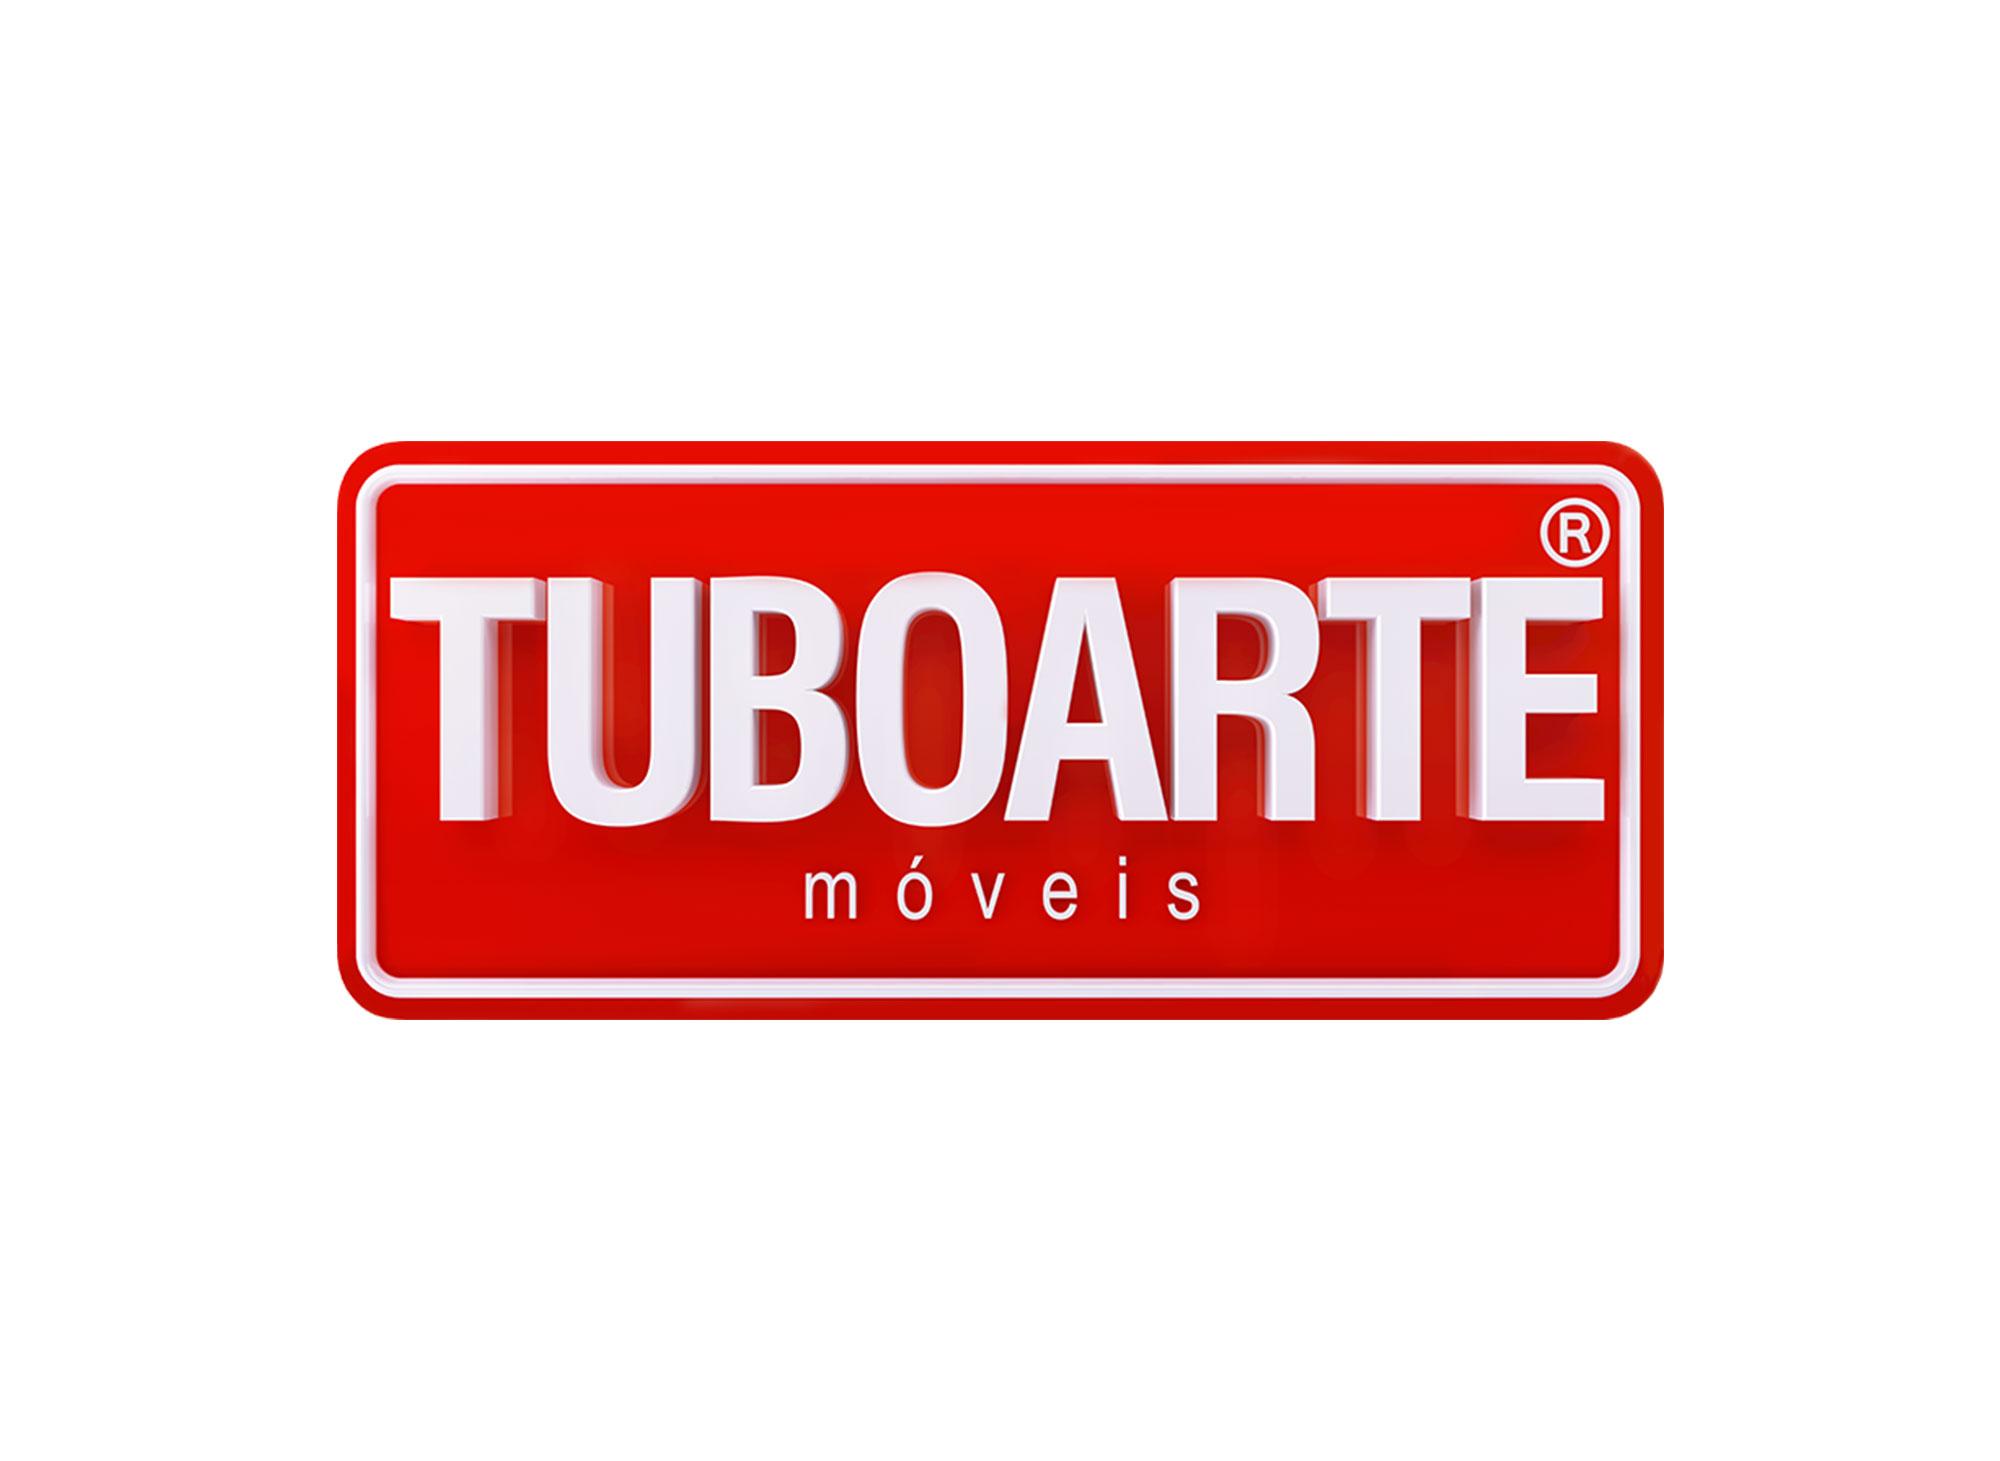 tuboarte-fabricante-moveis-cliente-agencia-diretriz-digital-marketing-fortaleza